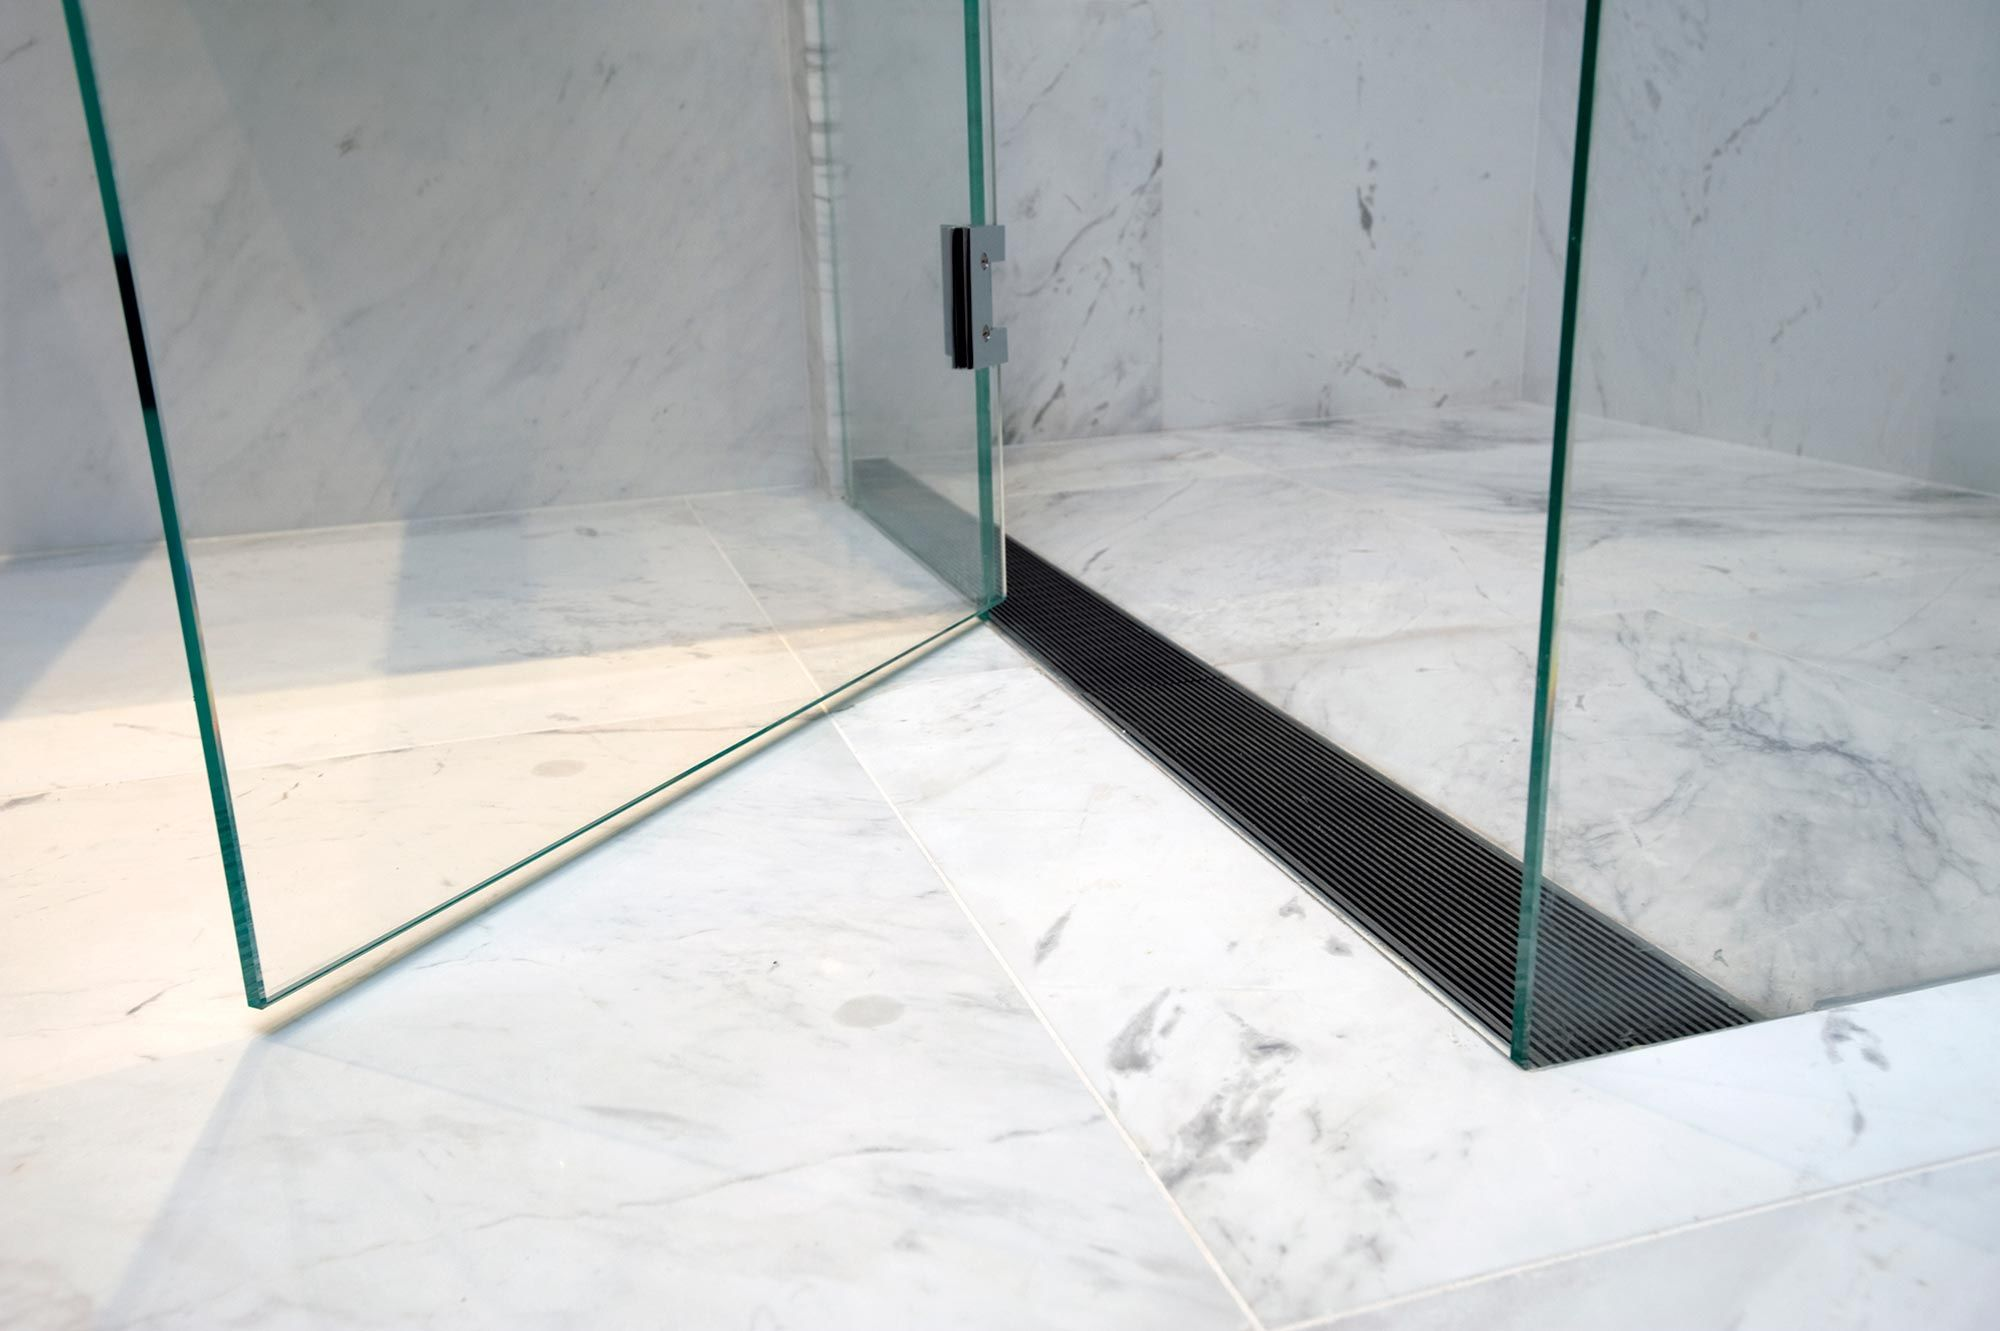 infinity drain detail coveted baths bathroom linear drain rh pinterest com